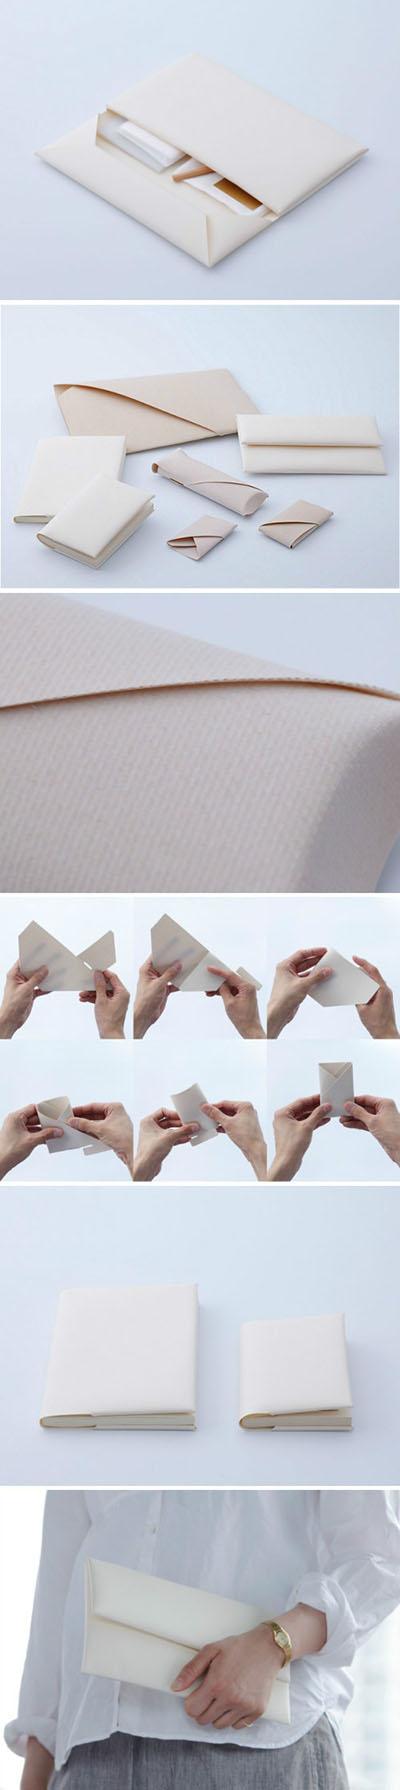 14 Paper folding 9b70afe